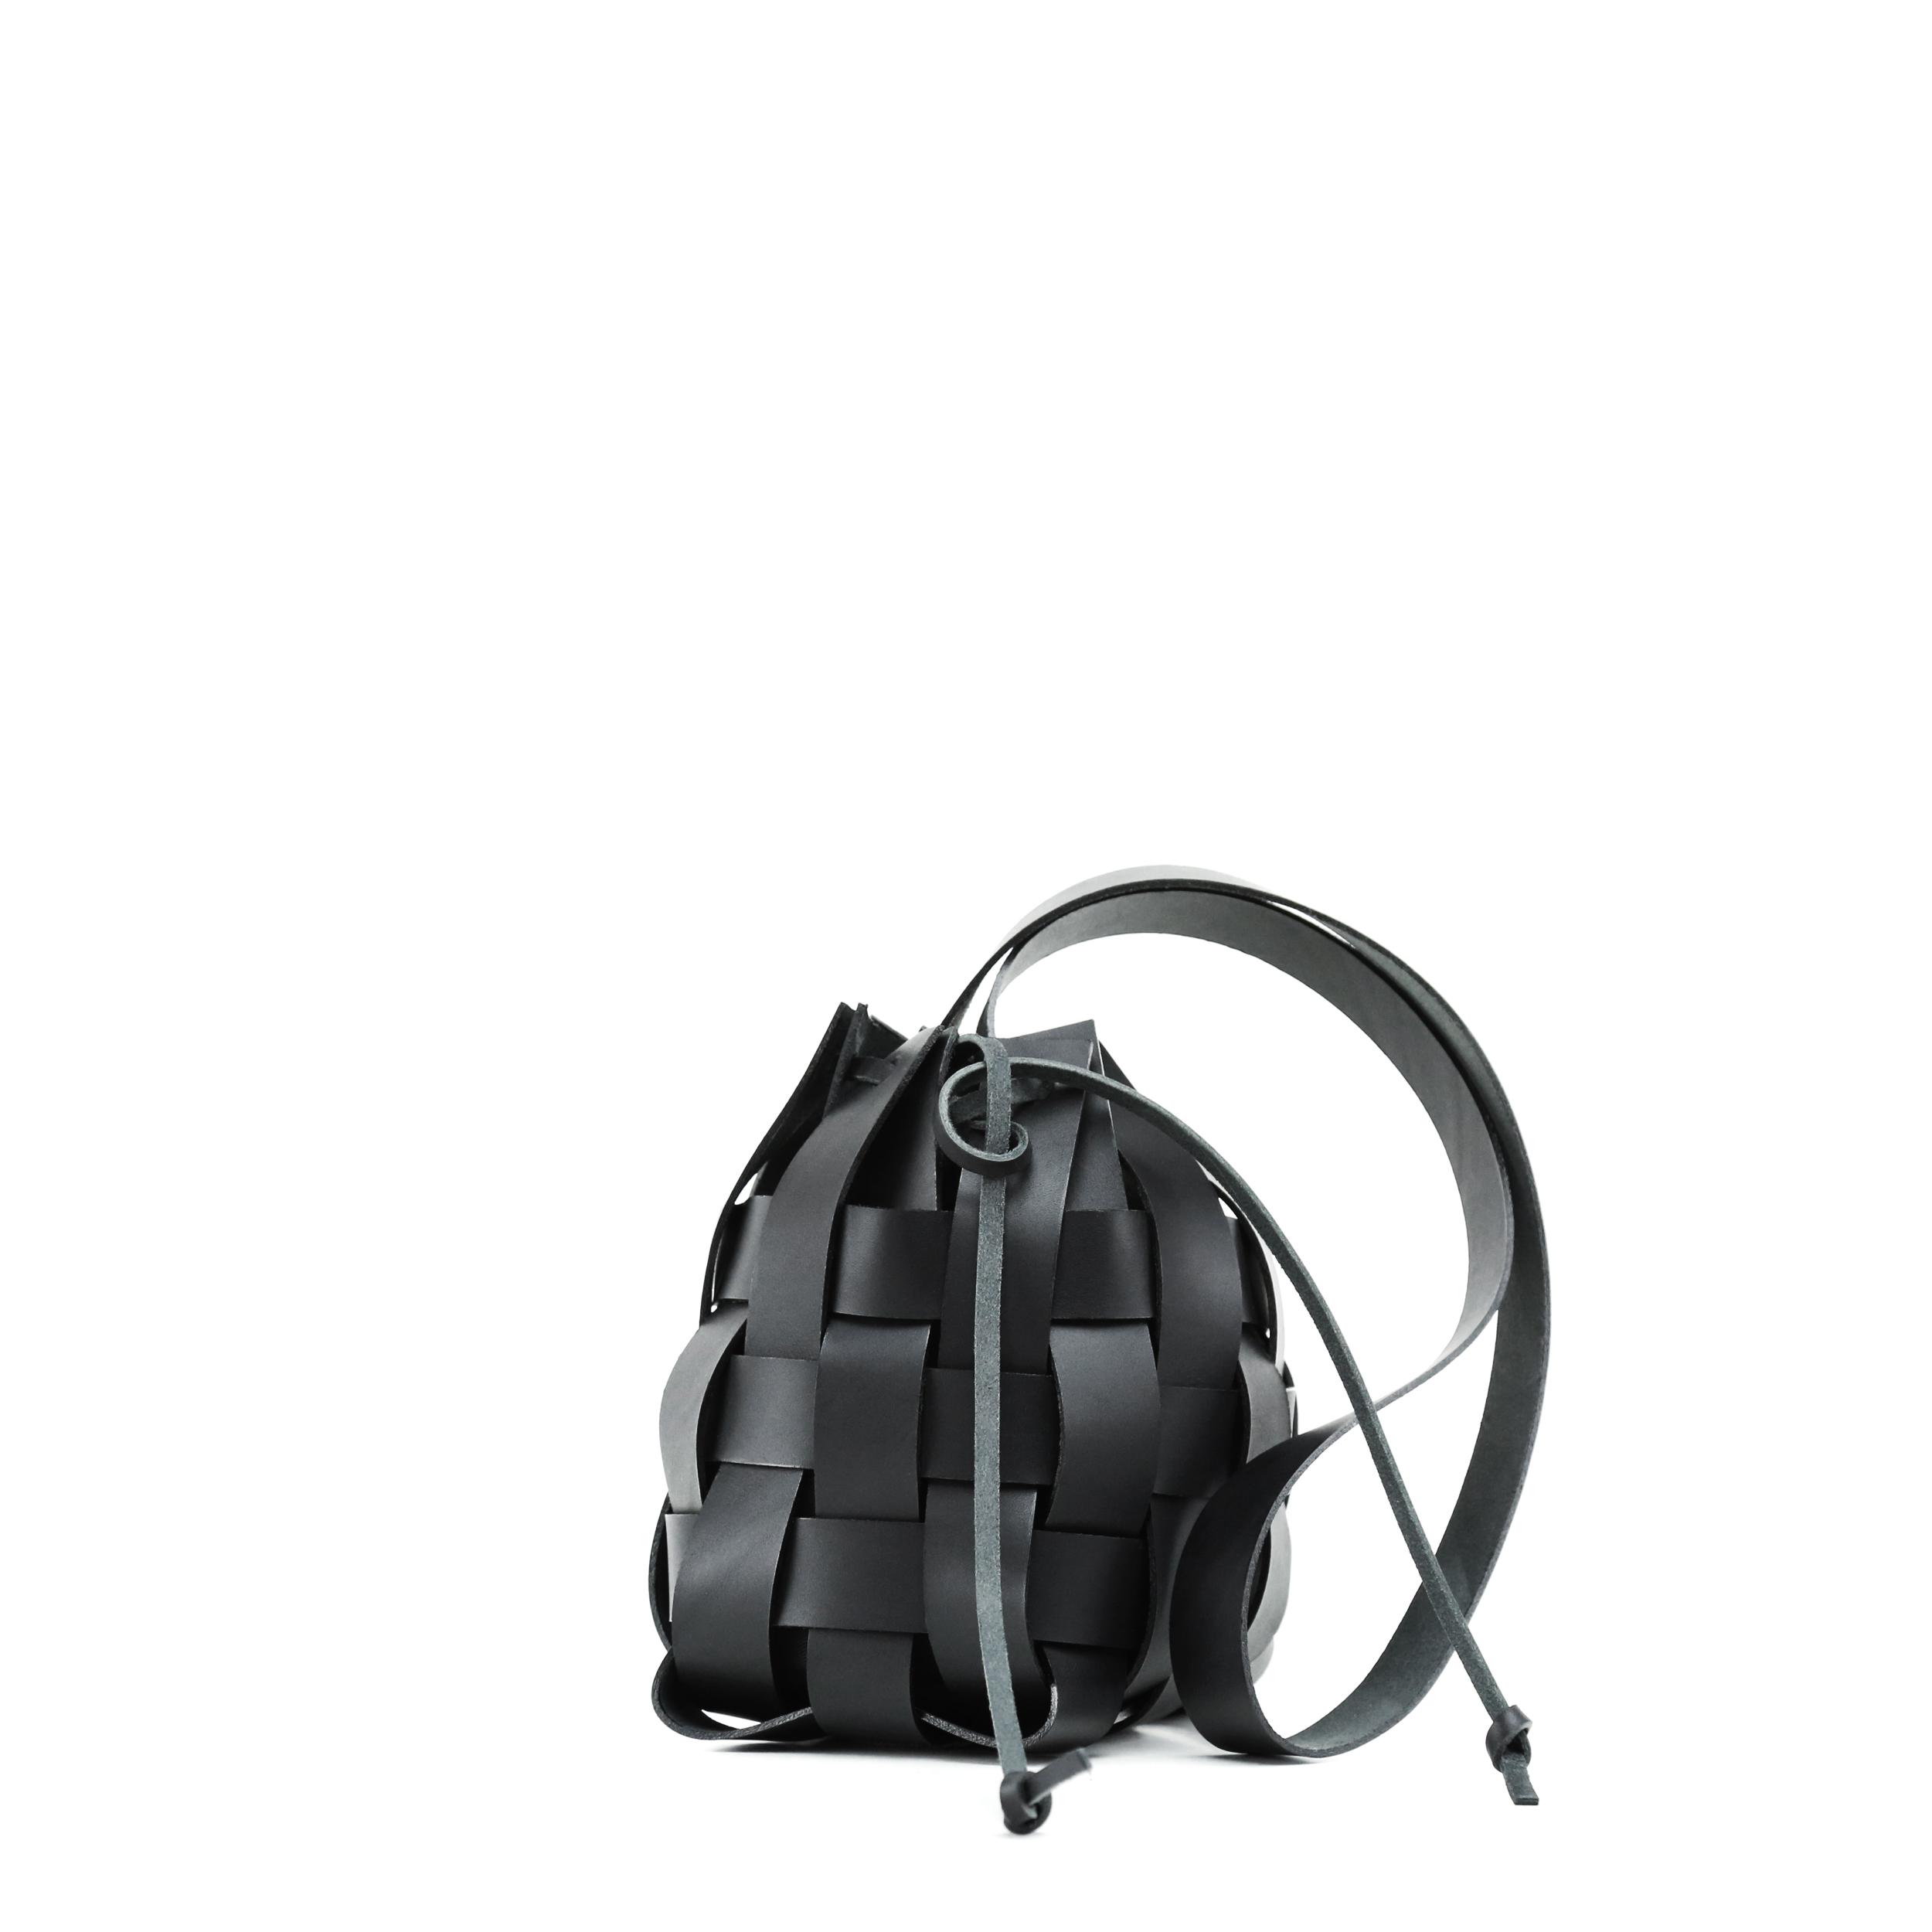 Torba-PANE-Woven-Basket-Bag-Black-2